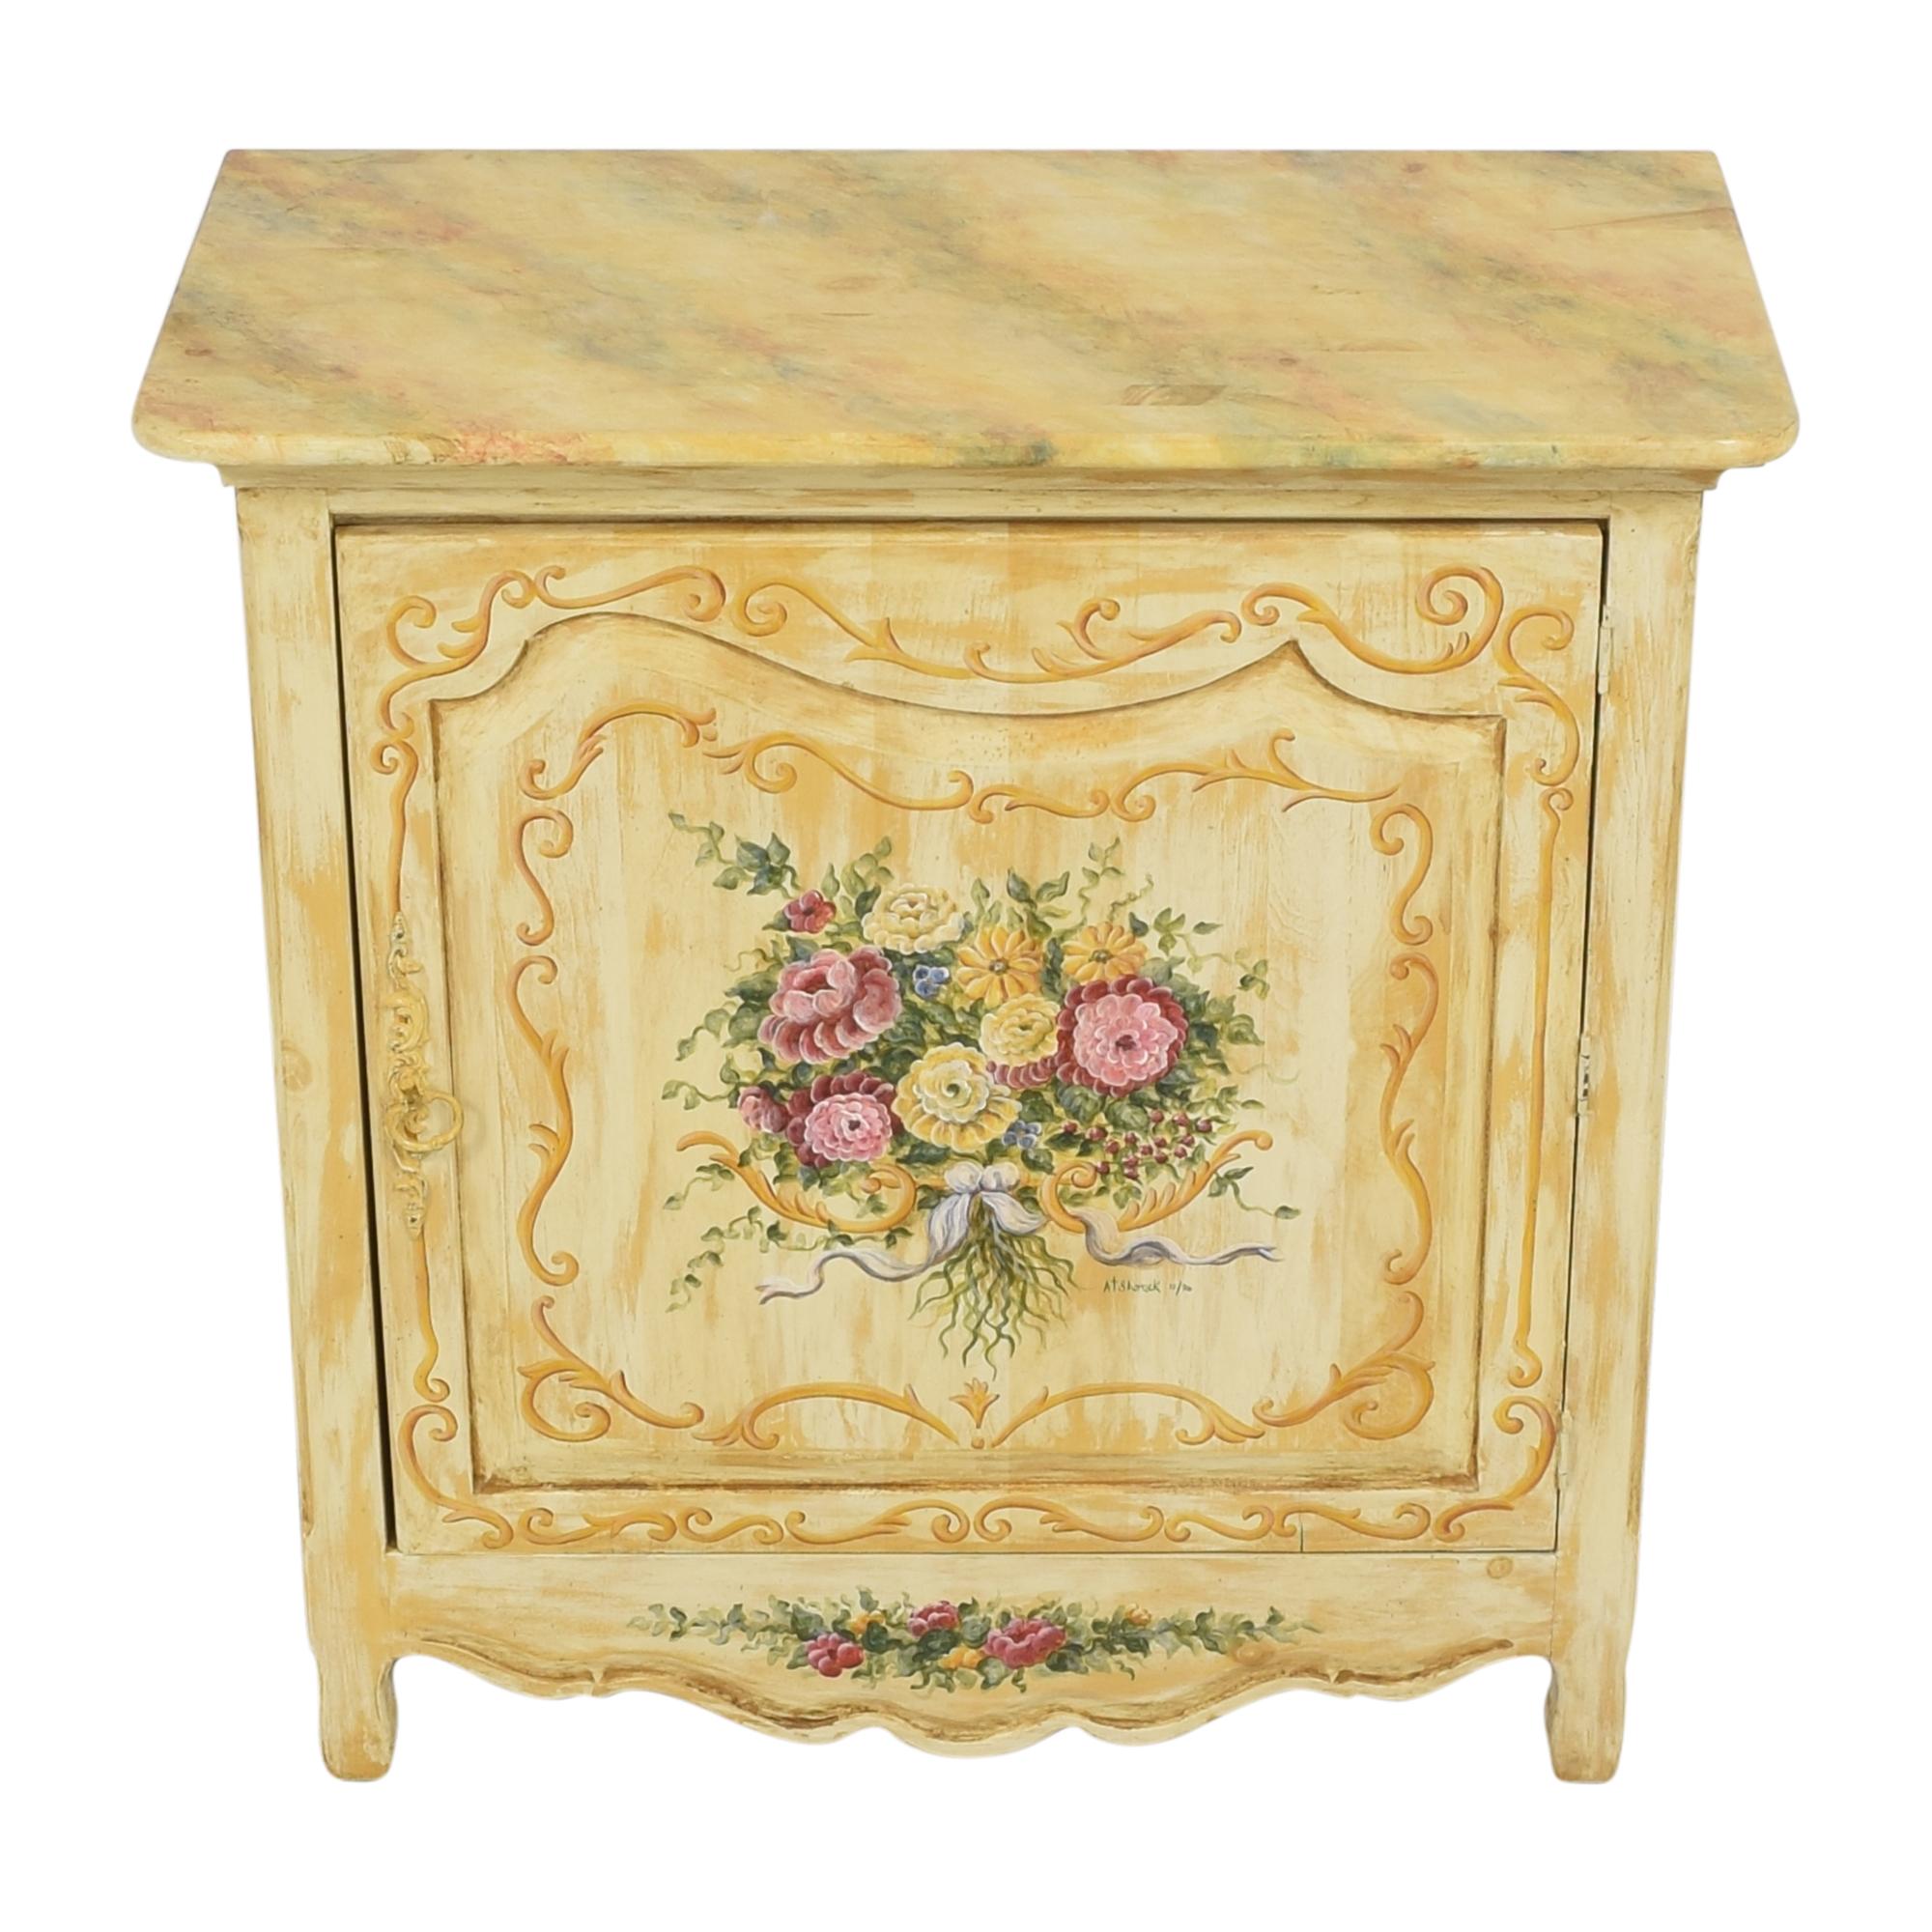 Habersham Habersham Antique-Style Side Table price